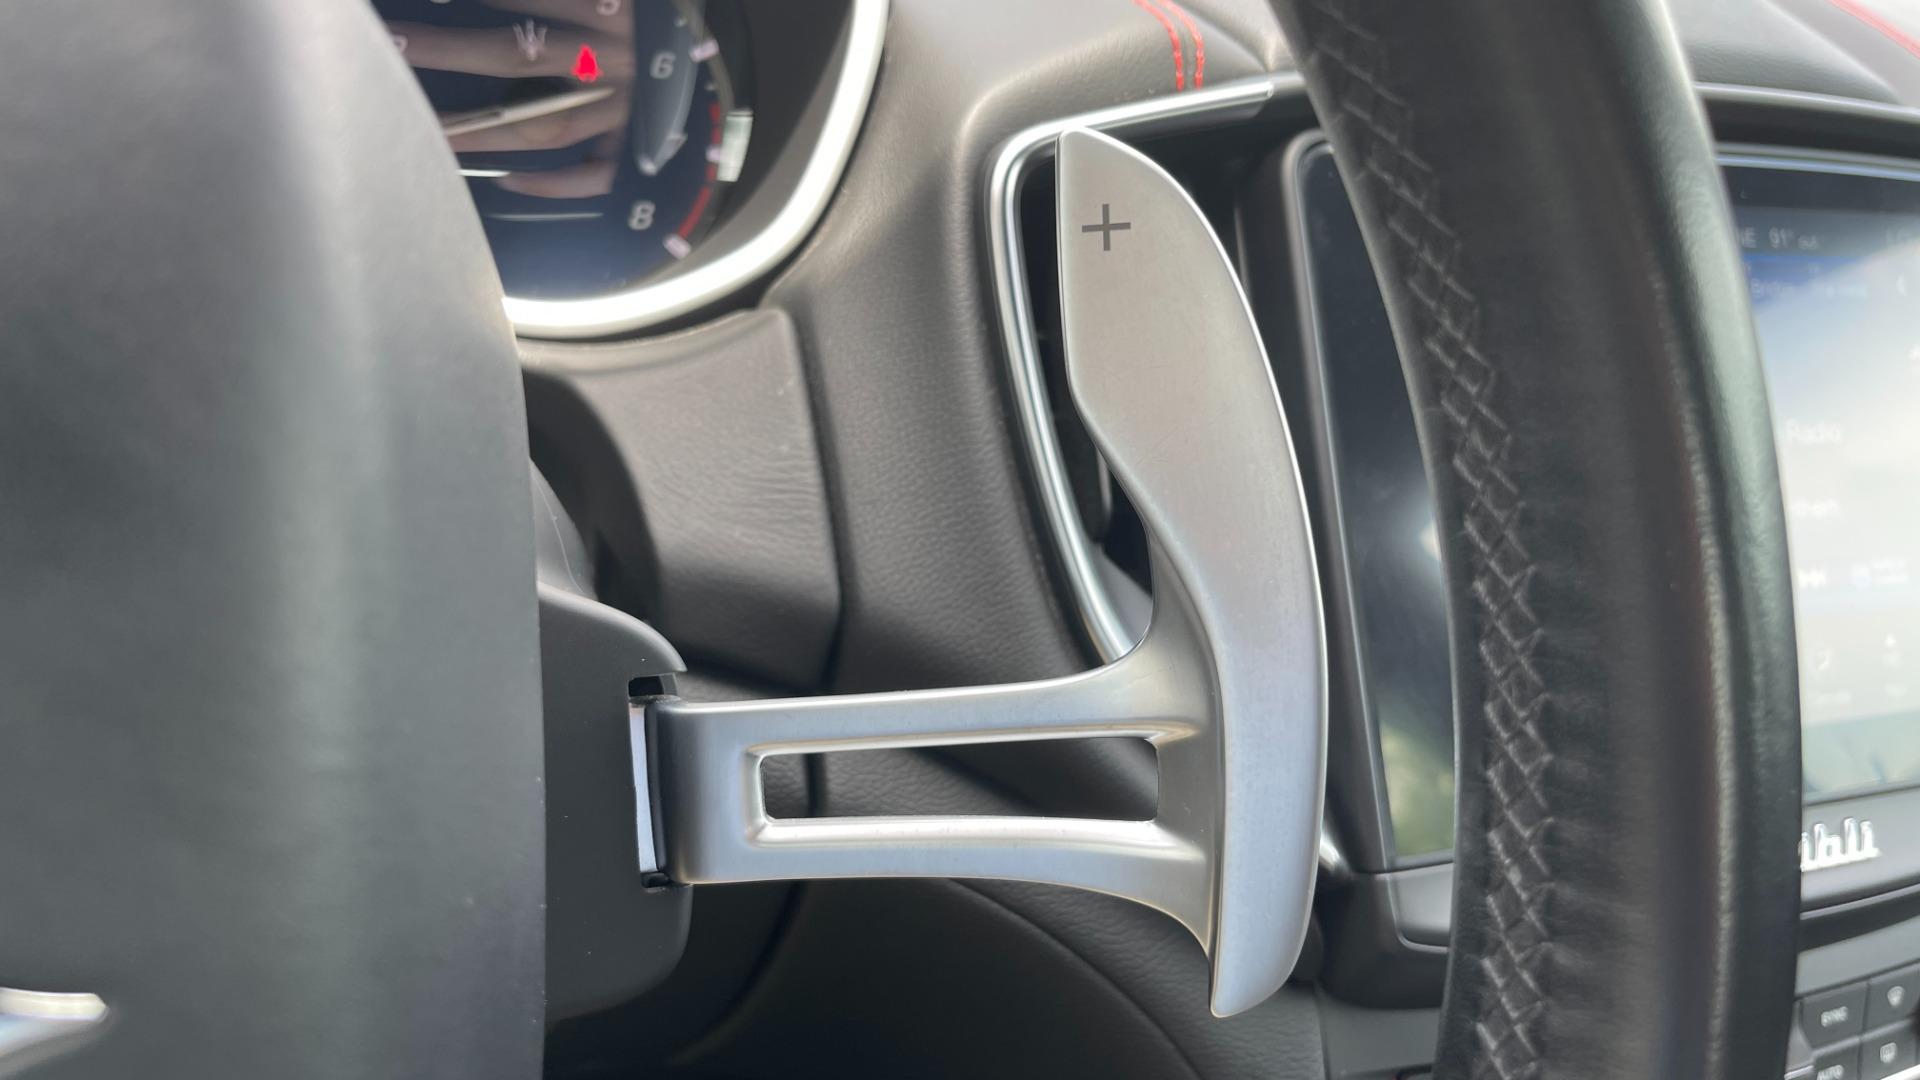 Used 2018 Maserati GHIBLI S Q4 SEDAN / AWD / 3.0L V6 / SUNROOF / NAV / REARVIEW for sale $51,995 at Formula Imports in Charlotte NC 28227 33